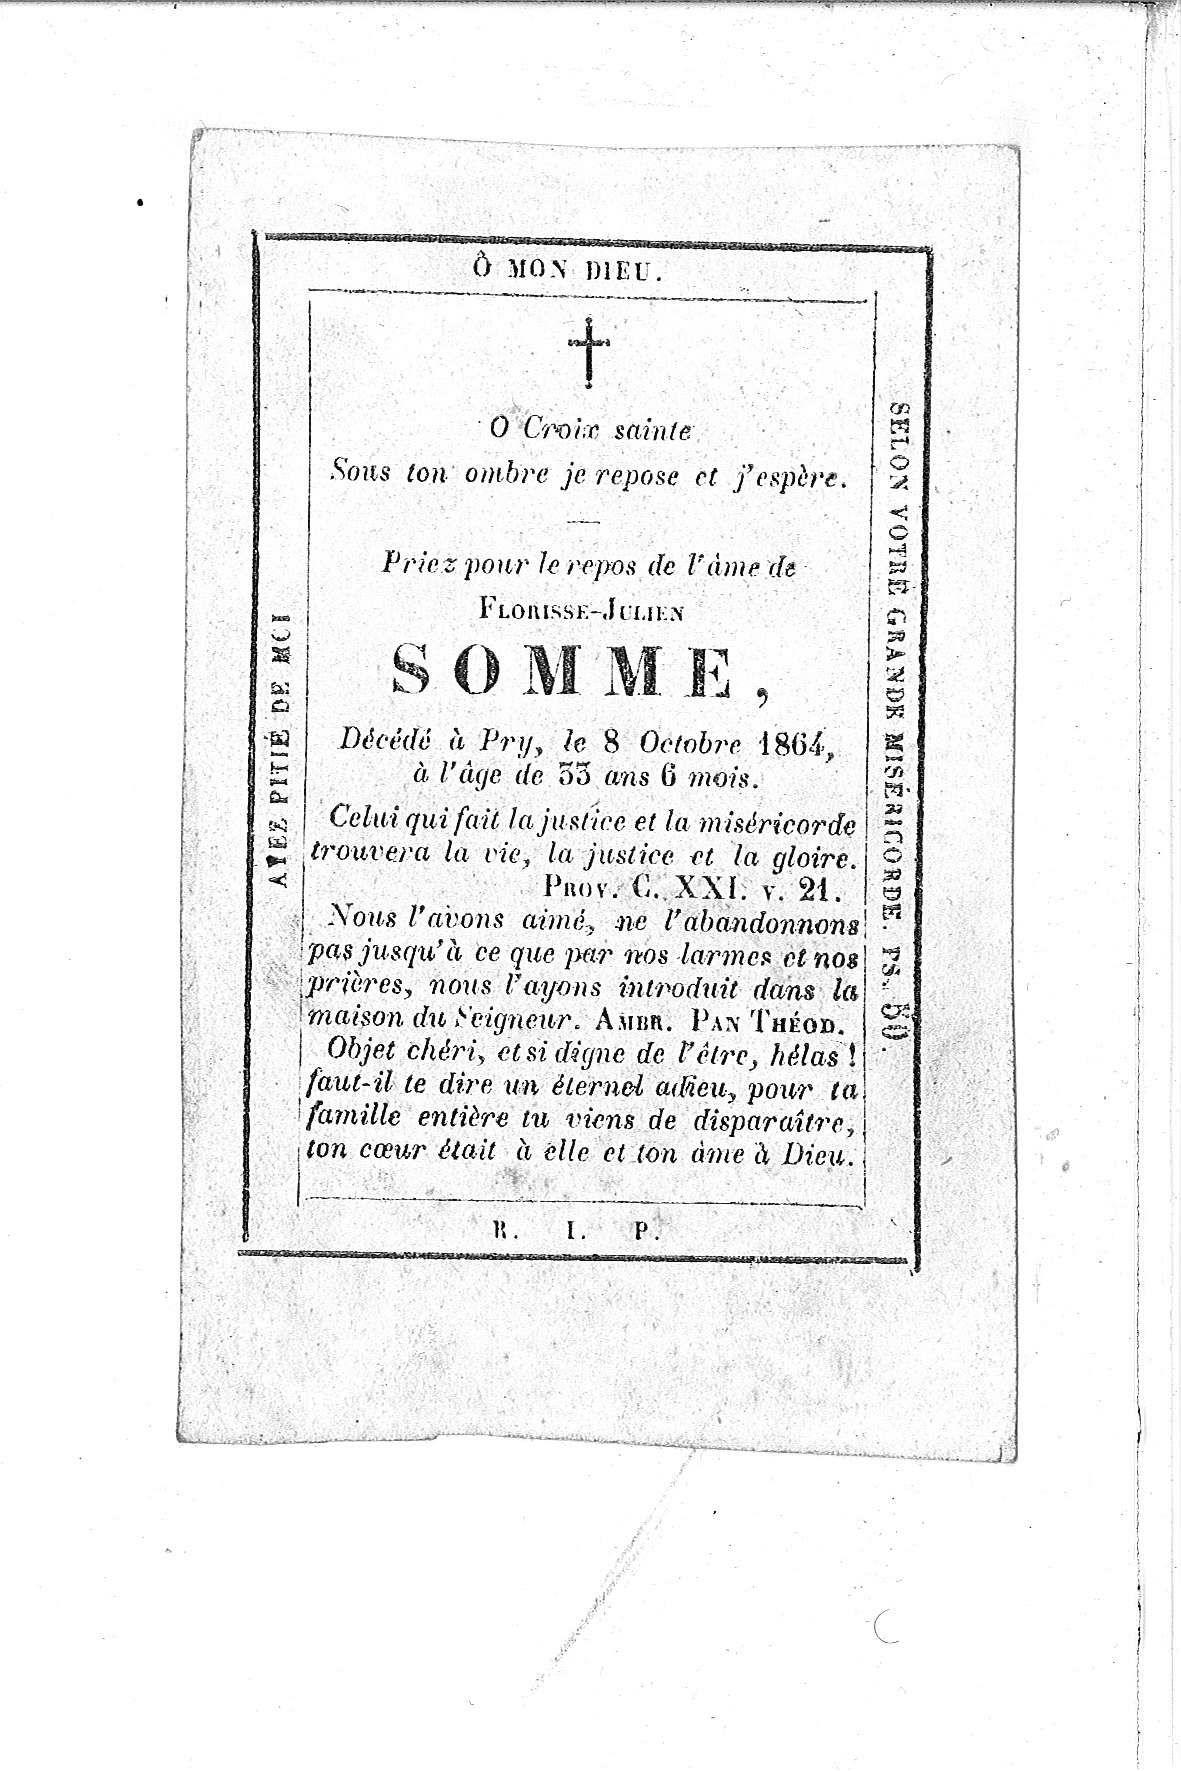 Florisse-Julien(1864)20100618155043_00034.jpg